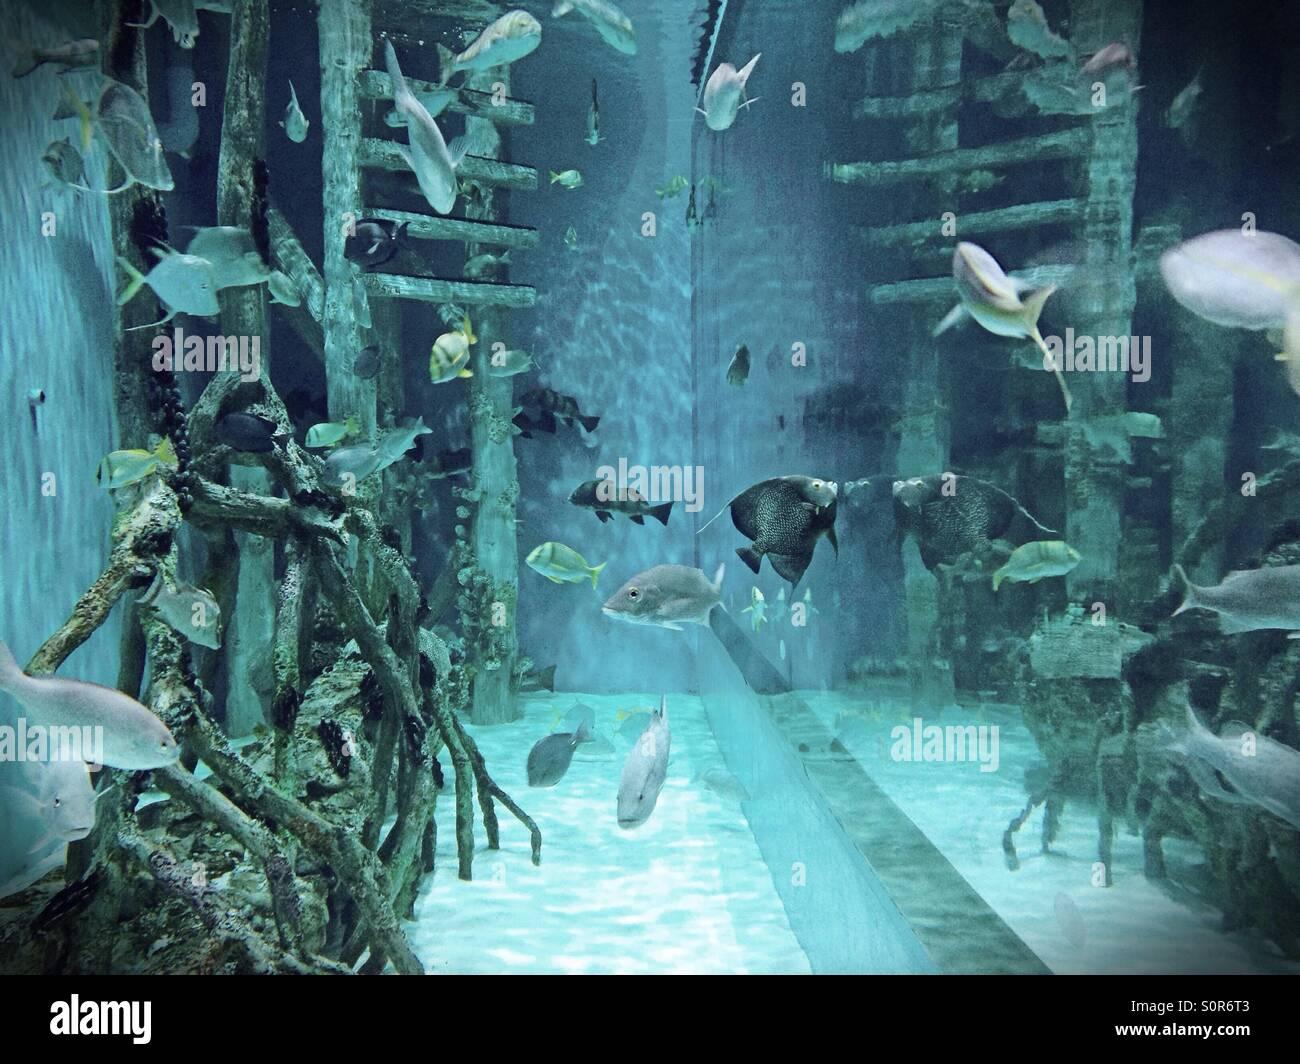 Oceanarium in St. Petersburg: address, photo, reviews 82